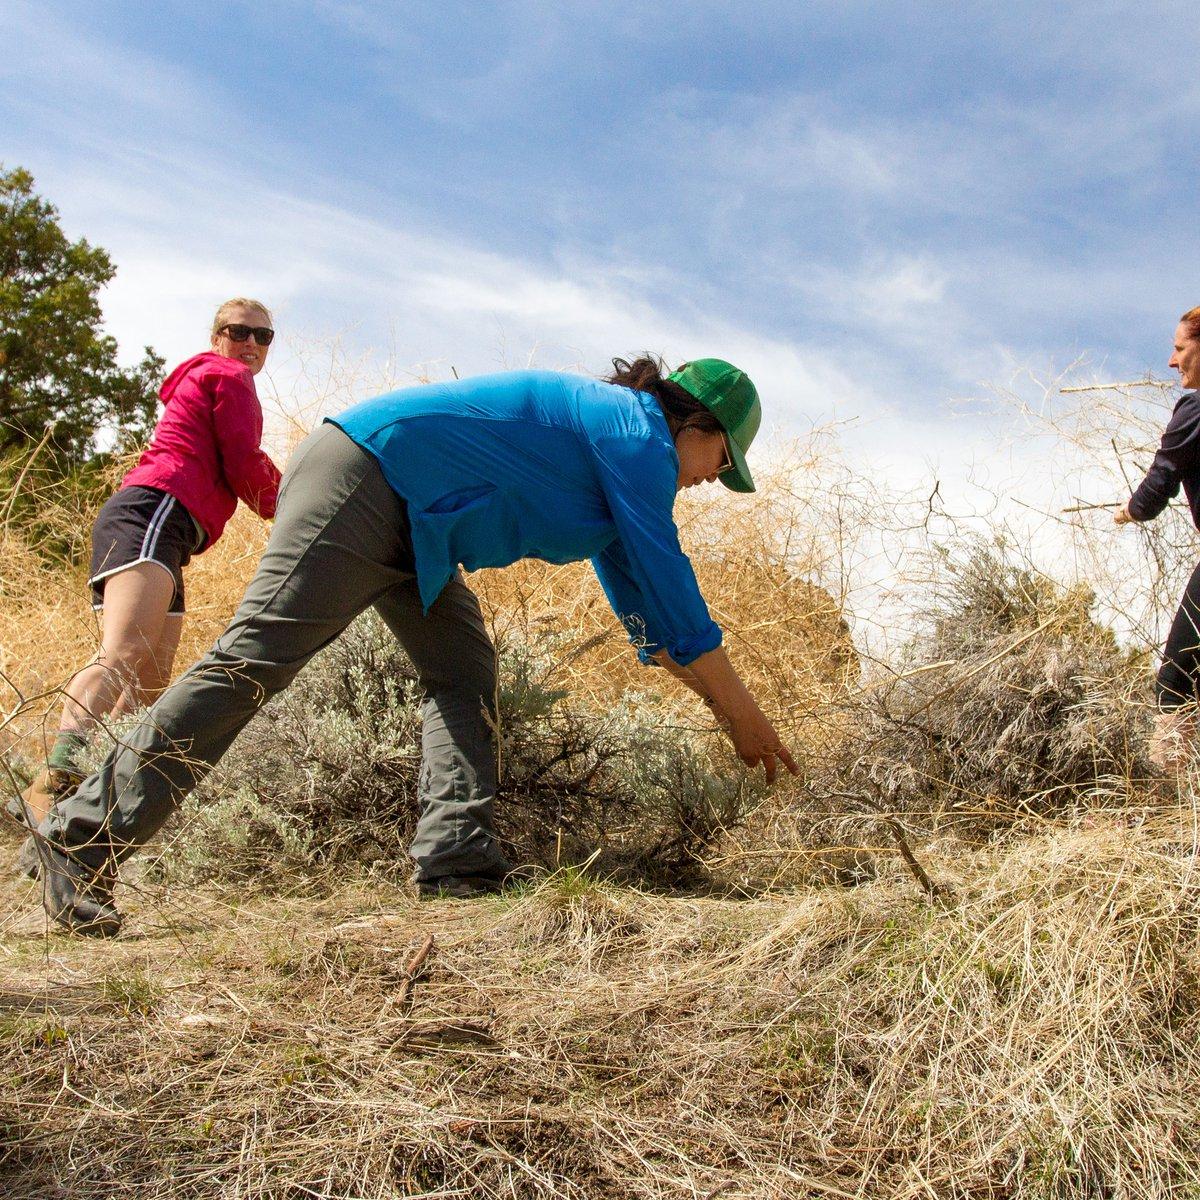 Three people perform trail maintenance